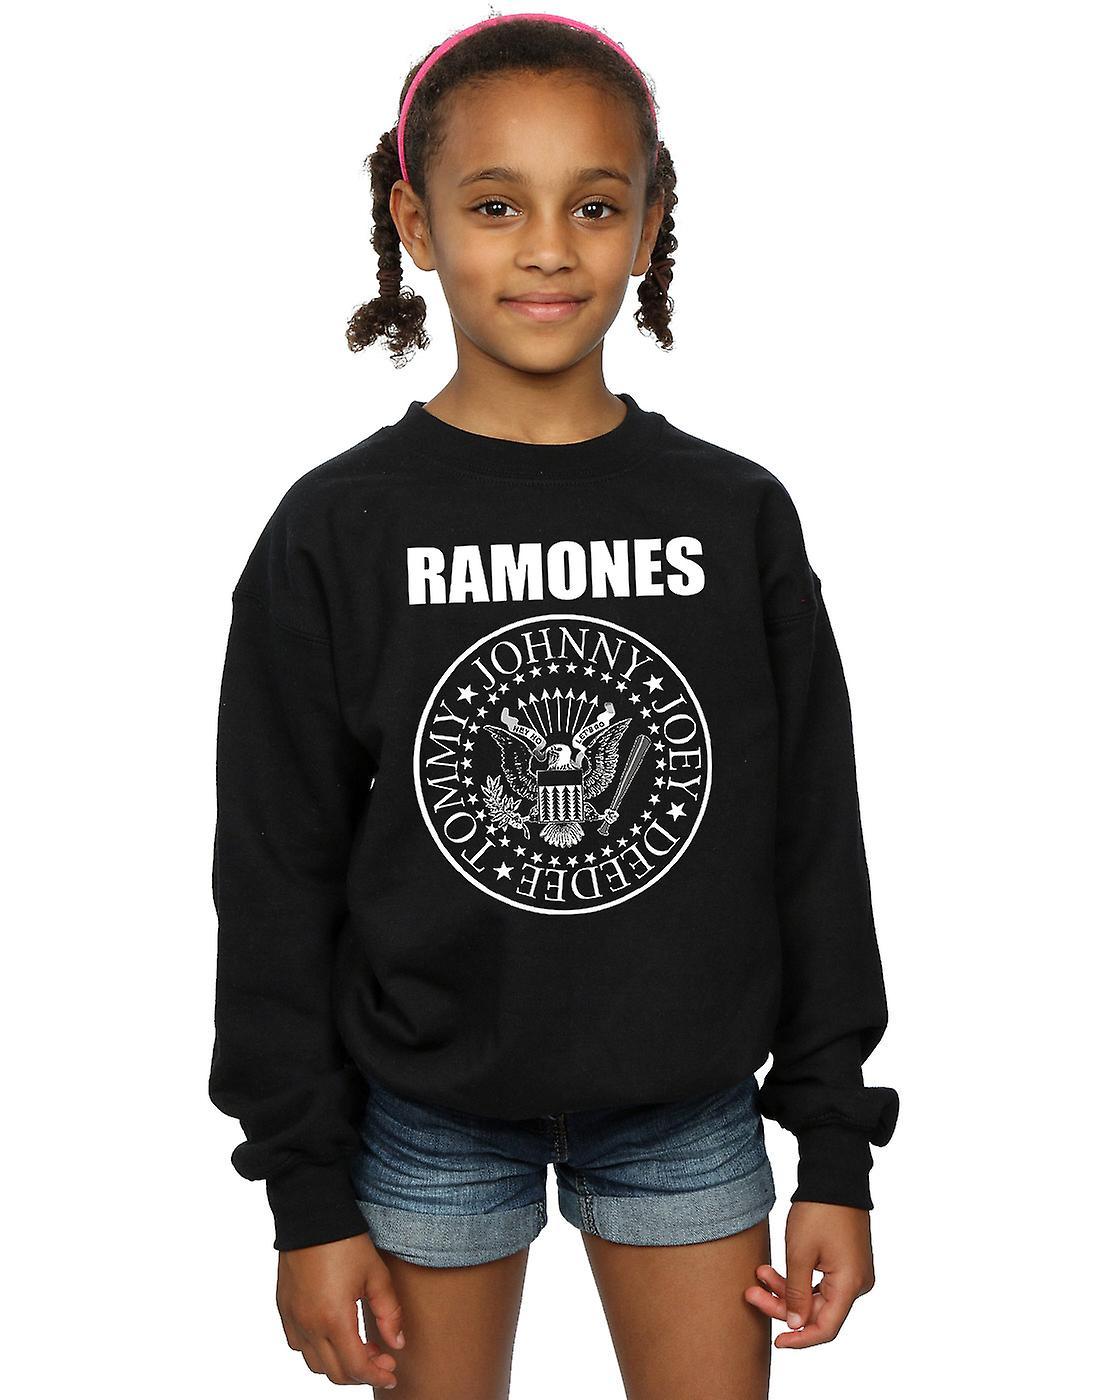 Ramones Girls Presidential Seal Sweatshirt